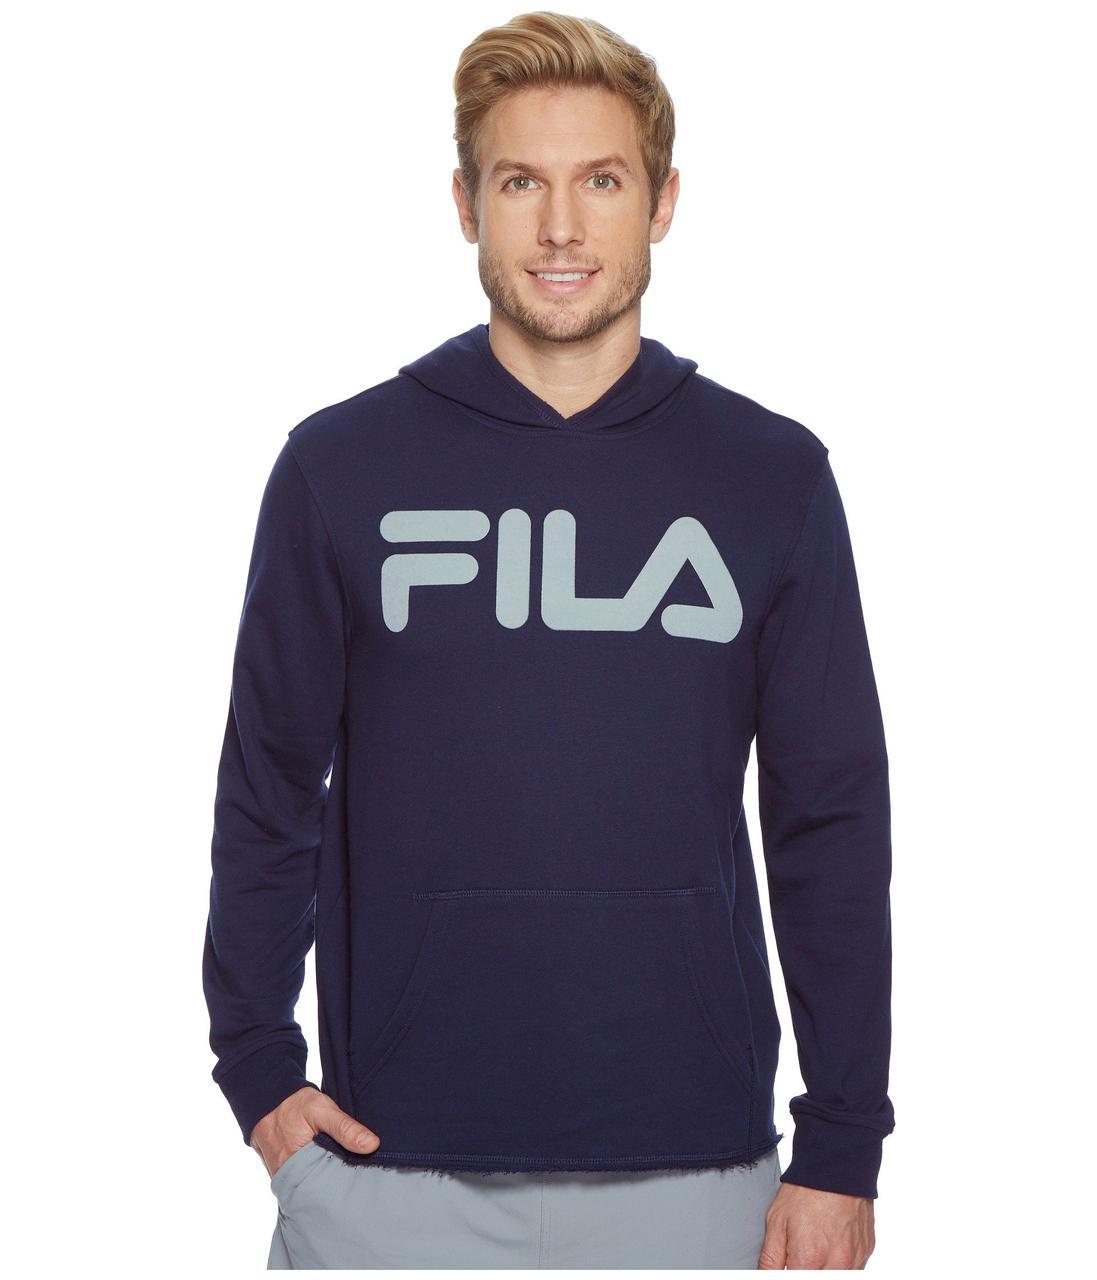 817c1e96 Толстовка Fila Locker Room Hoodie Navy/High Rise - Оригинал - FAIR -  оригинальная одежда